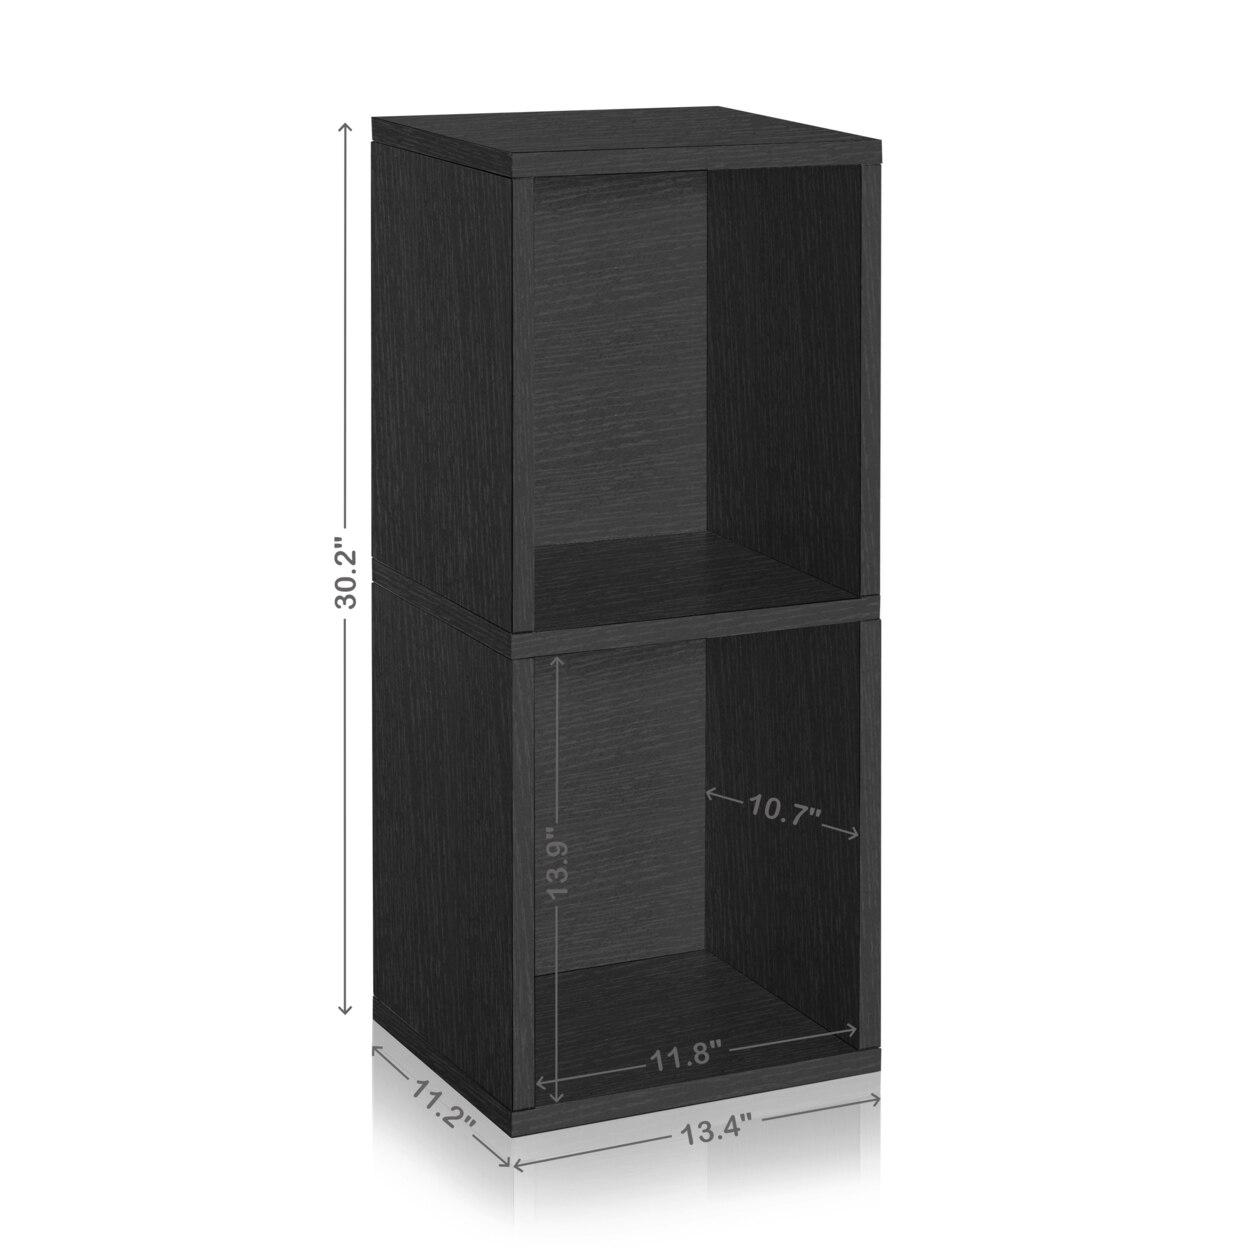 Eco 2 Shelf Duo Bookcase and Storage Shelf, Black Wood Grain - Tool Free Assembly - LIFETIME WARRANTY стойка для акустики waterfall подставка под акустику shelf stands hurricane black